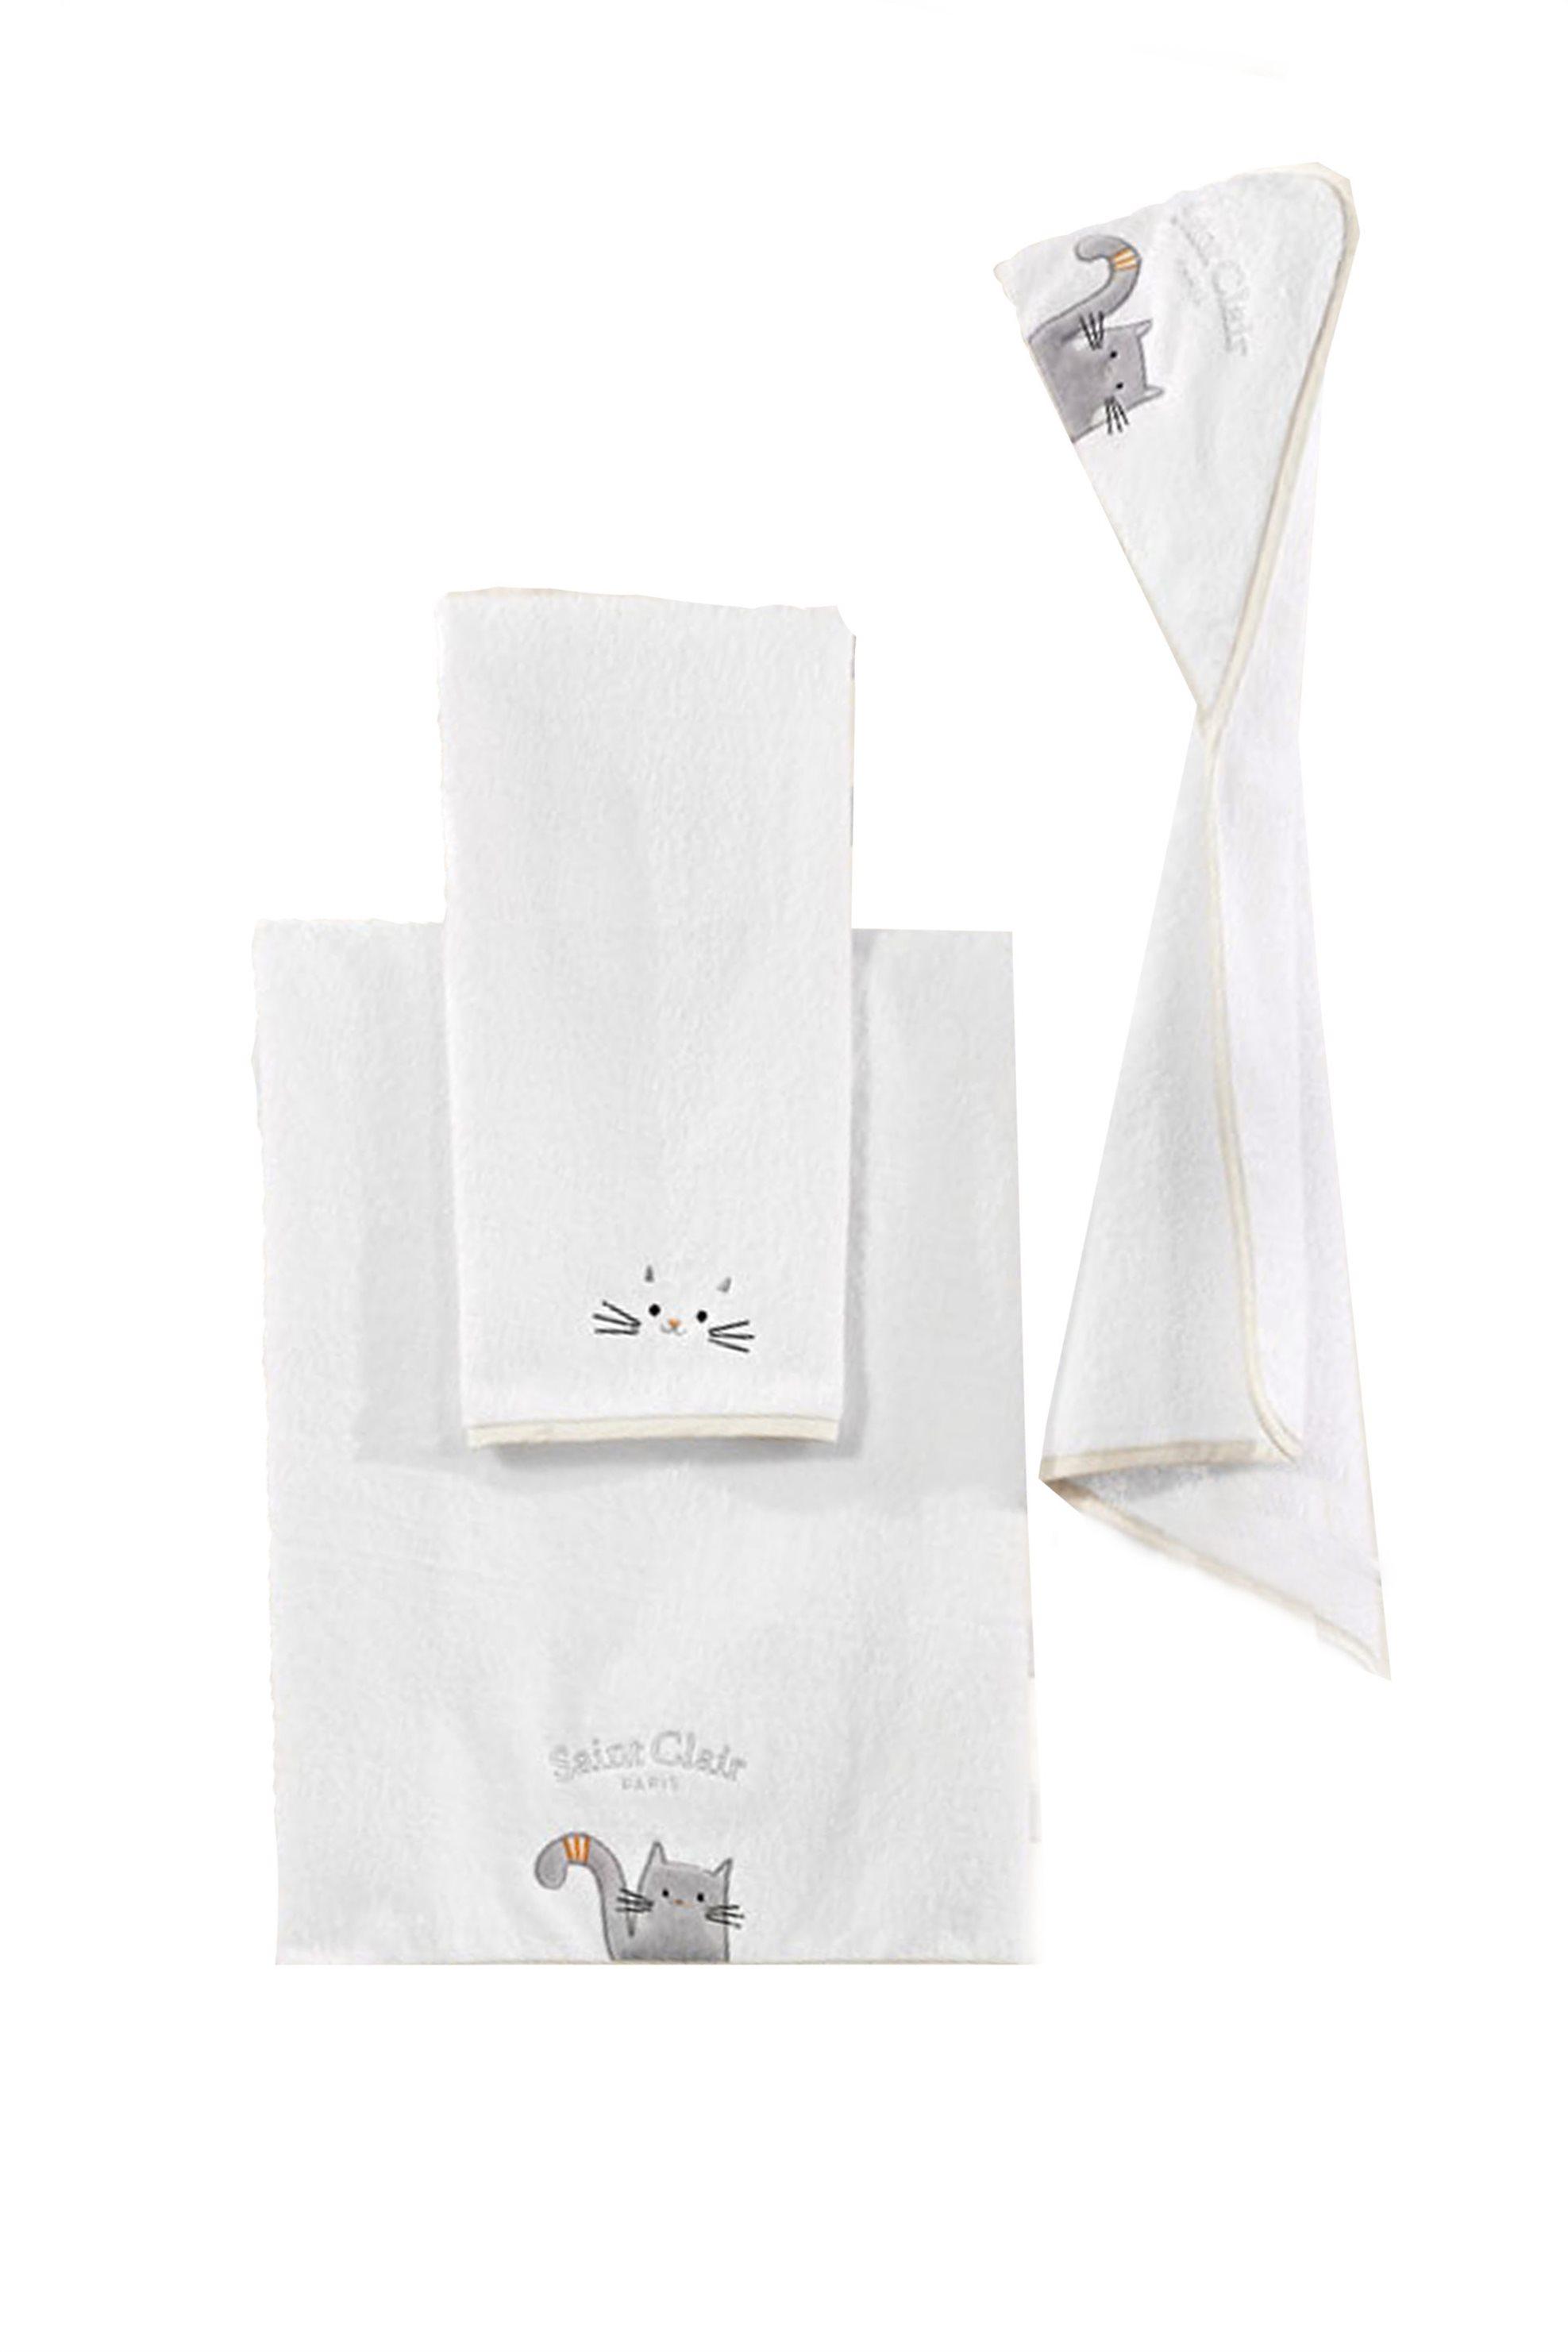 Saint Clair Paris Σετ βρεφικές πετσέτες δύο τεμαχίων Max - 1722090217000 - Λευκό home   παιδια   πετσέτες   σετ παιδικές πετσέτες